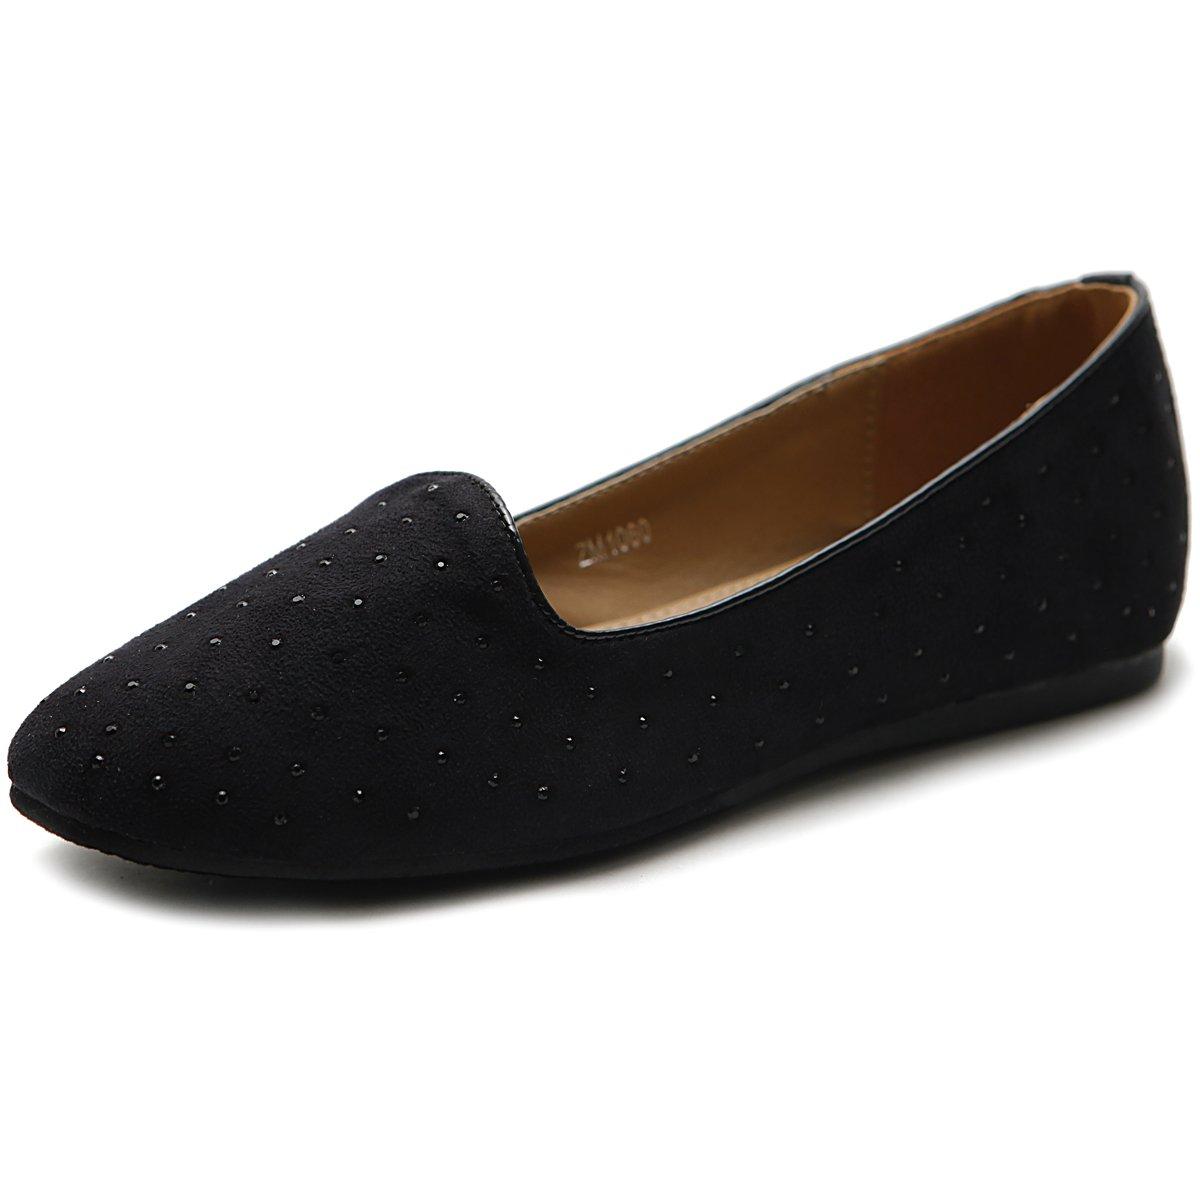 Ollio Women's Shoe Ballet Suede Jewel Stud Comfort Flat B00MV4ZLPM 7.5 B(M) US|Black